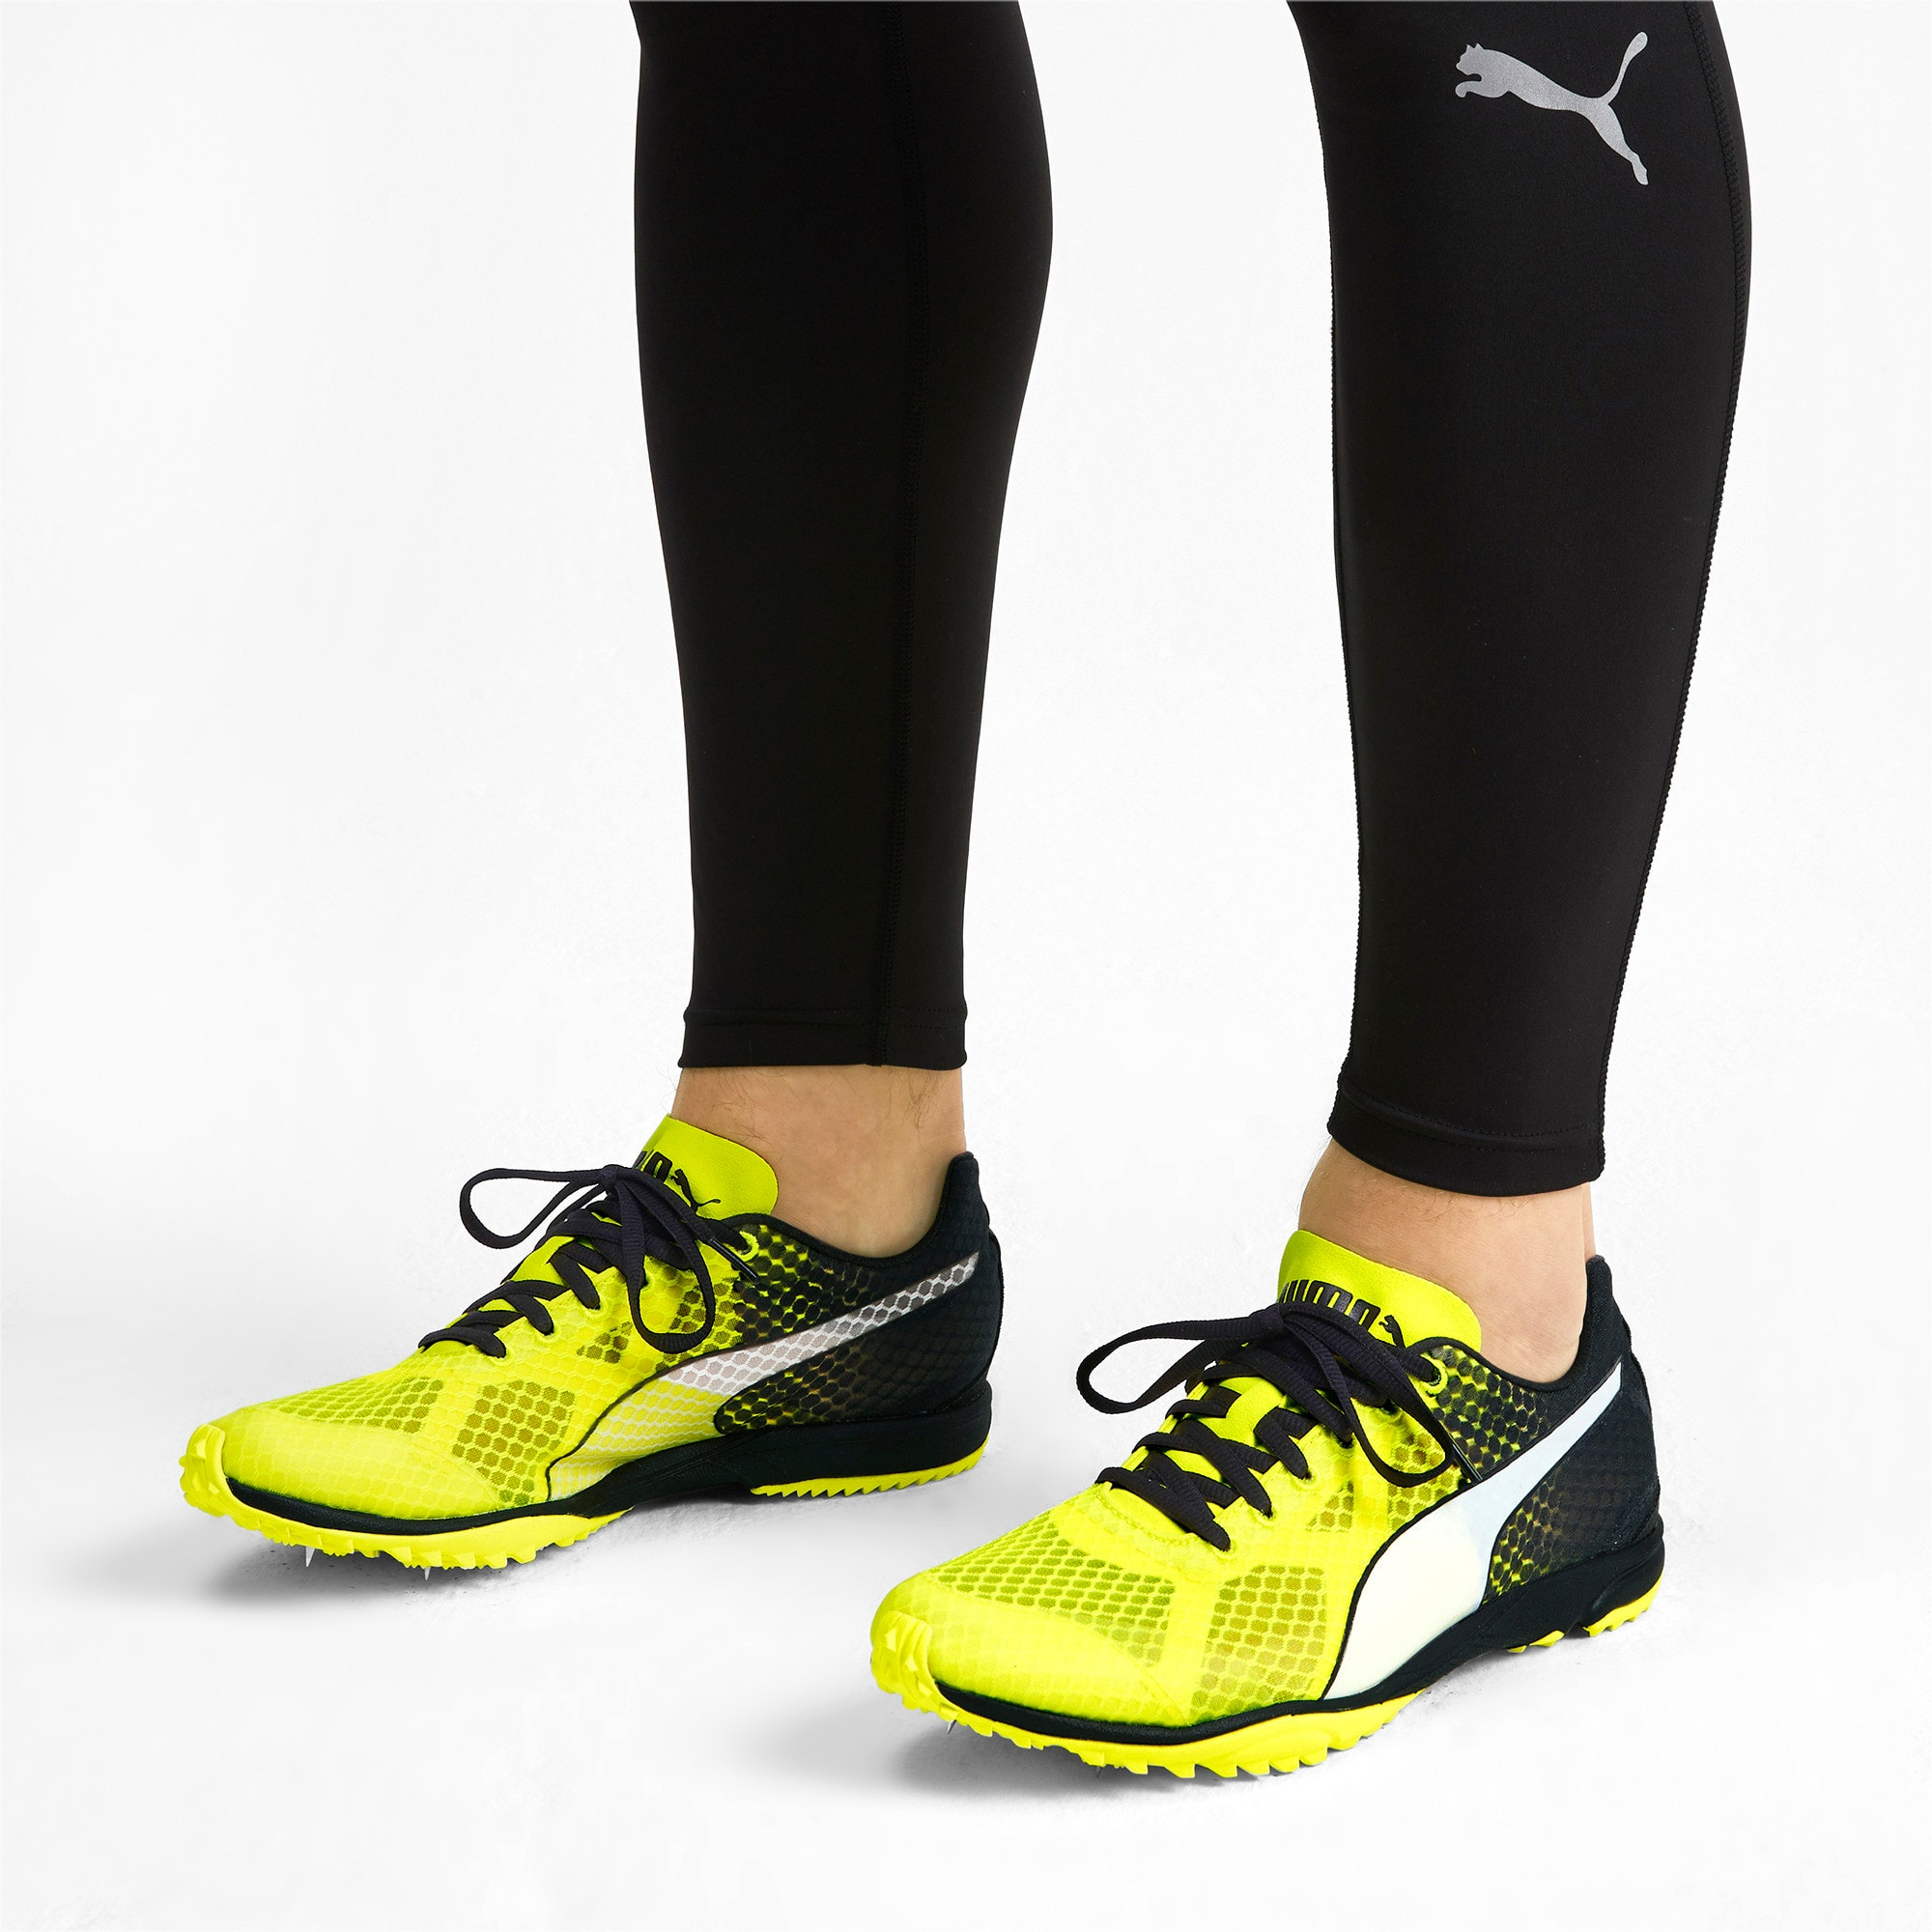 Thumbnail 3 of evoSPEED Haraka 6 Track and Field Boots, Yellow Alert-Black-White, medium-IND